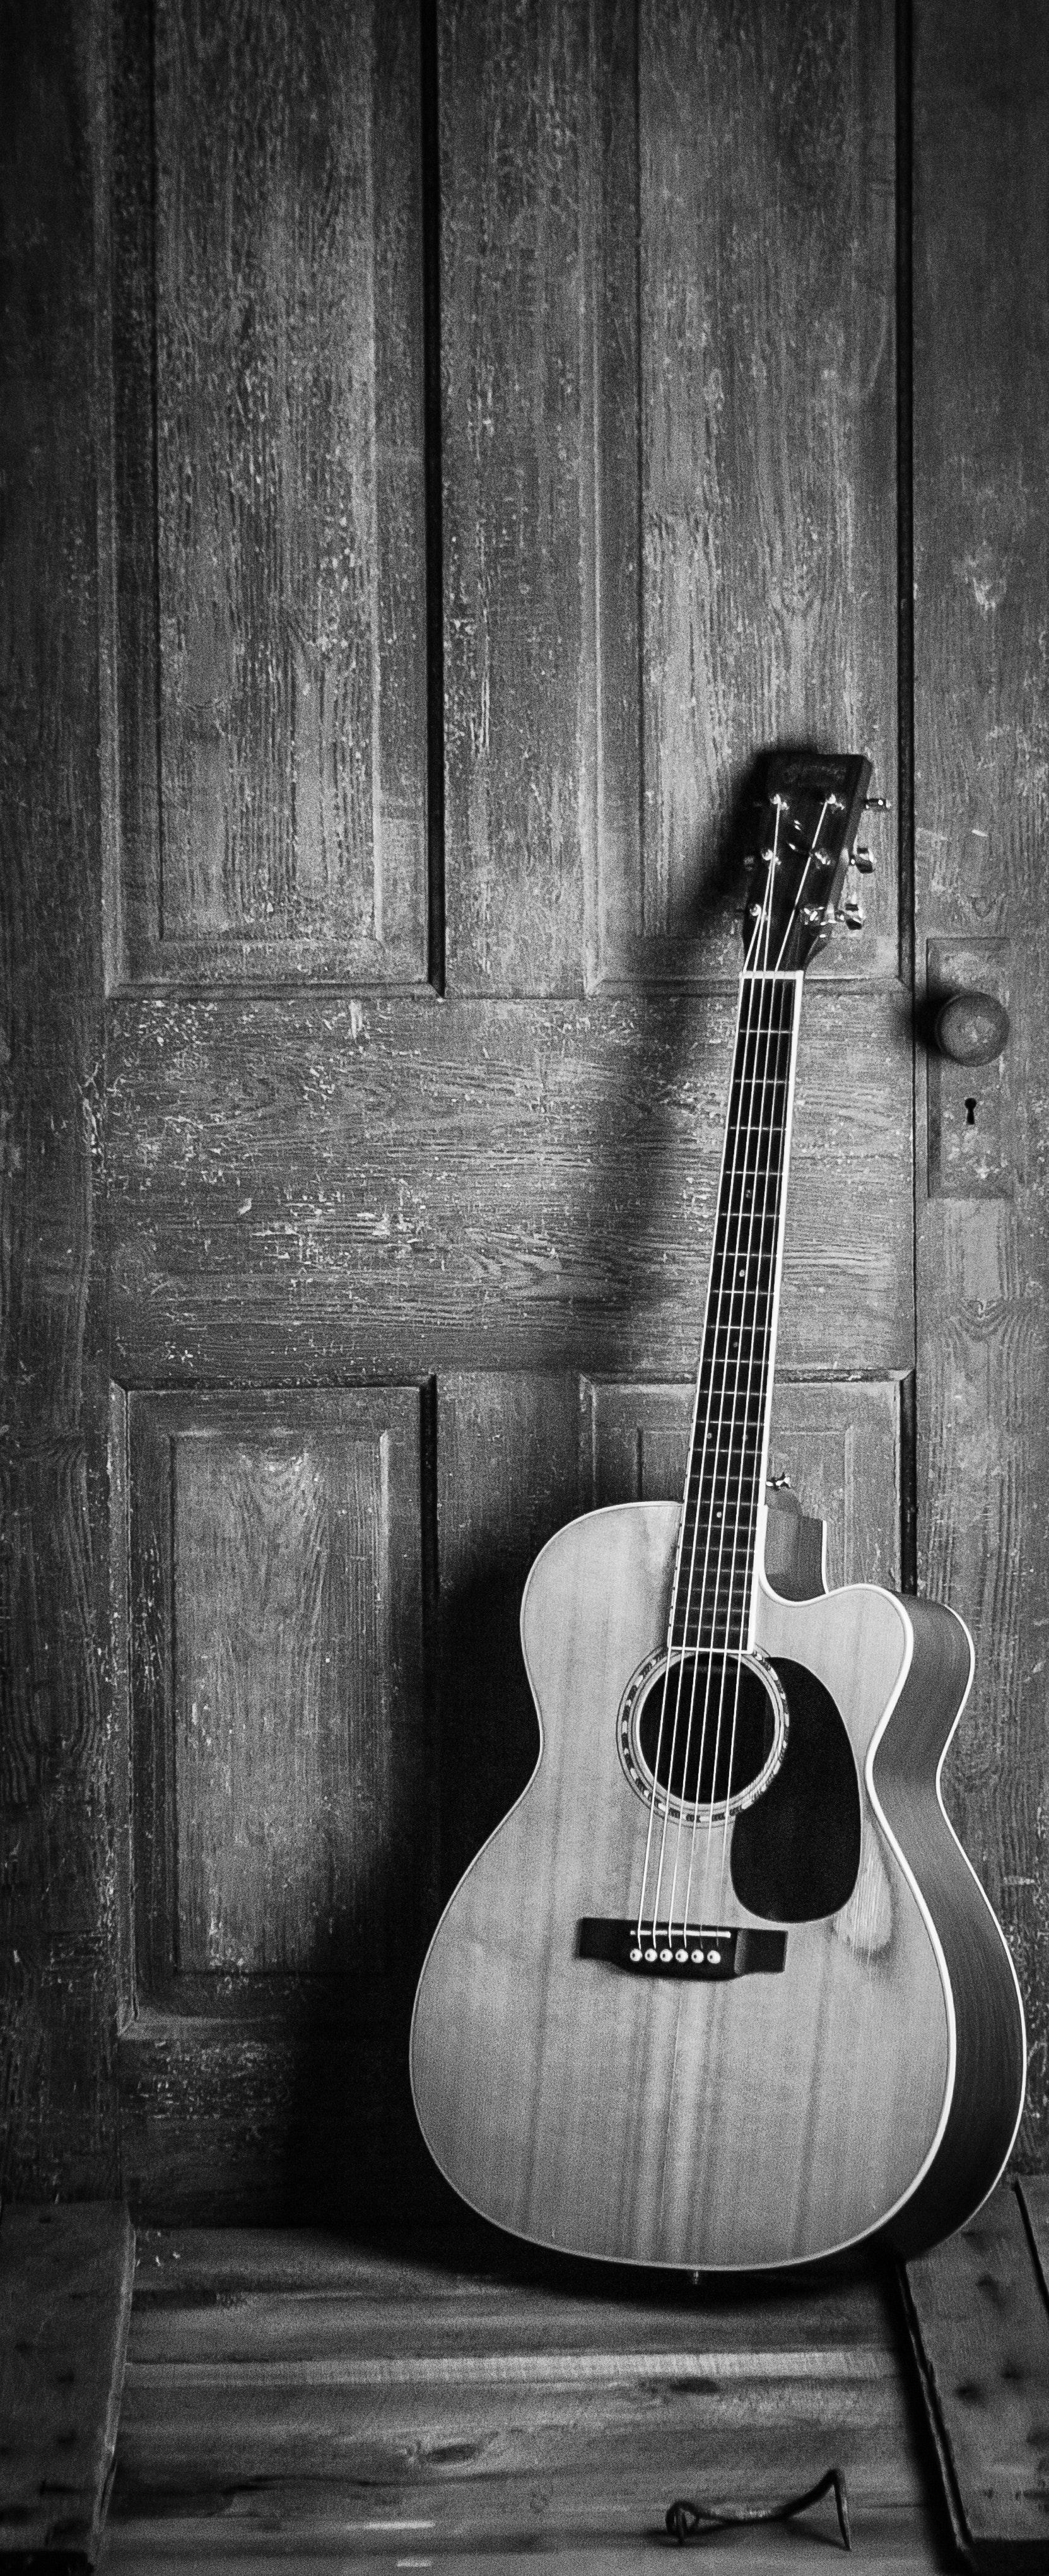 antique-black-and-white-black-and-white-1010519.jpg